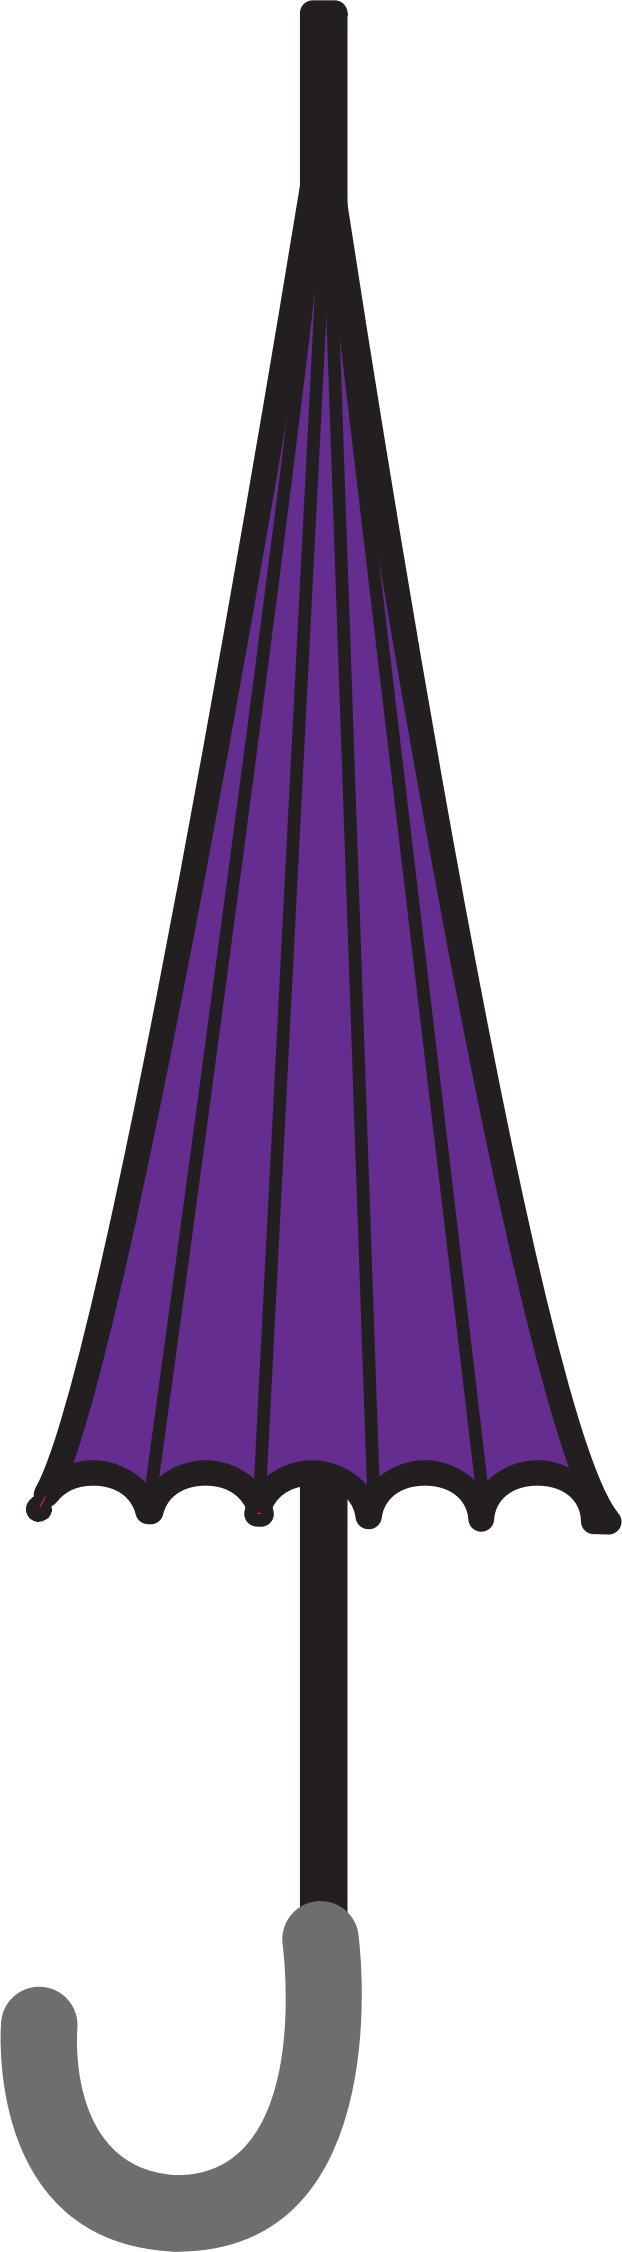 Clipart - Closed Umbrella